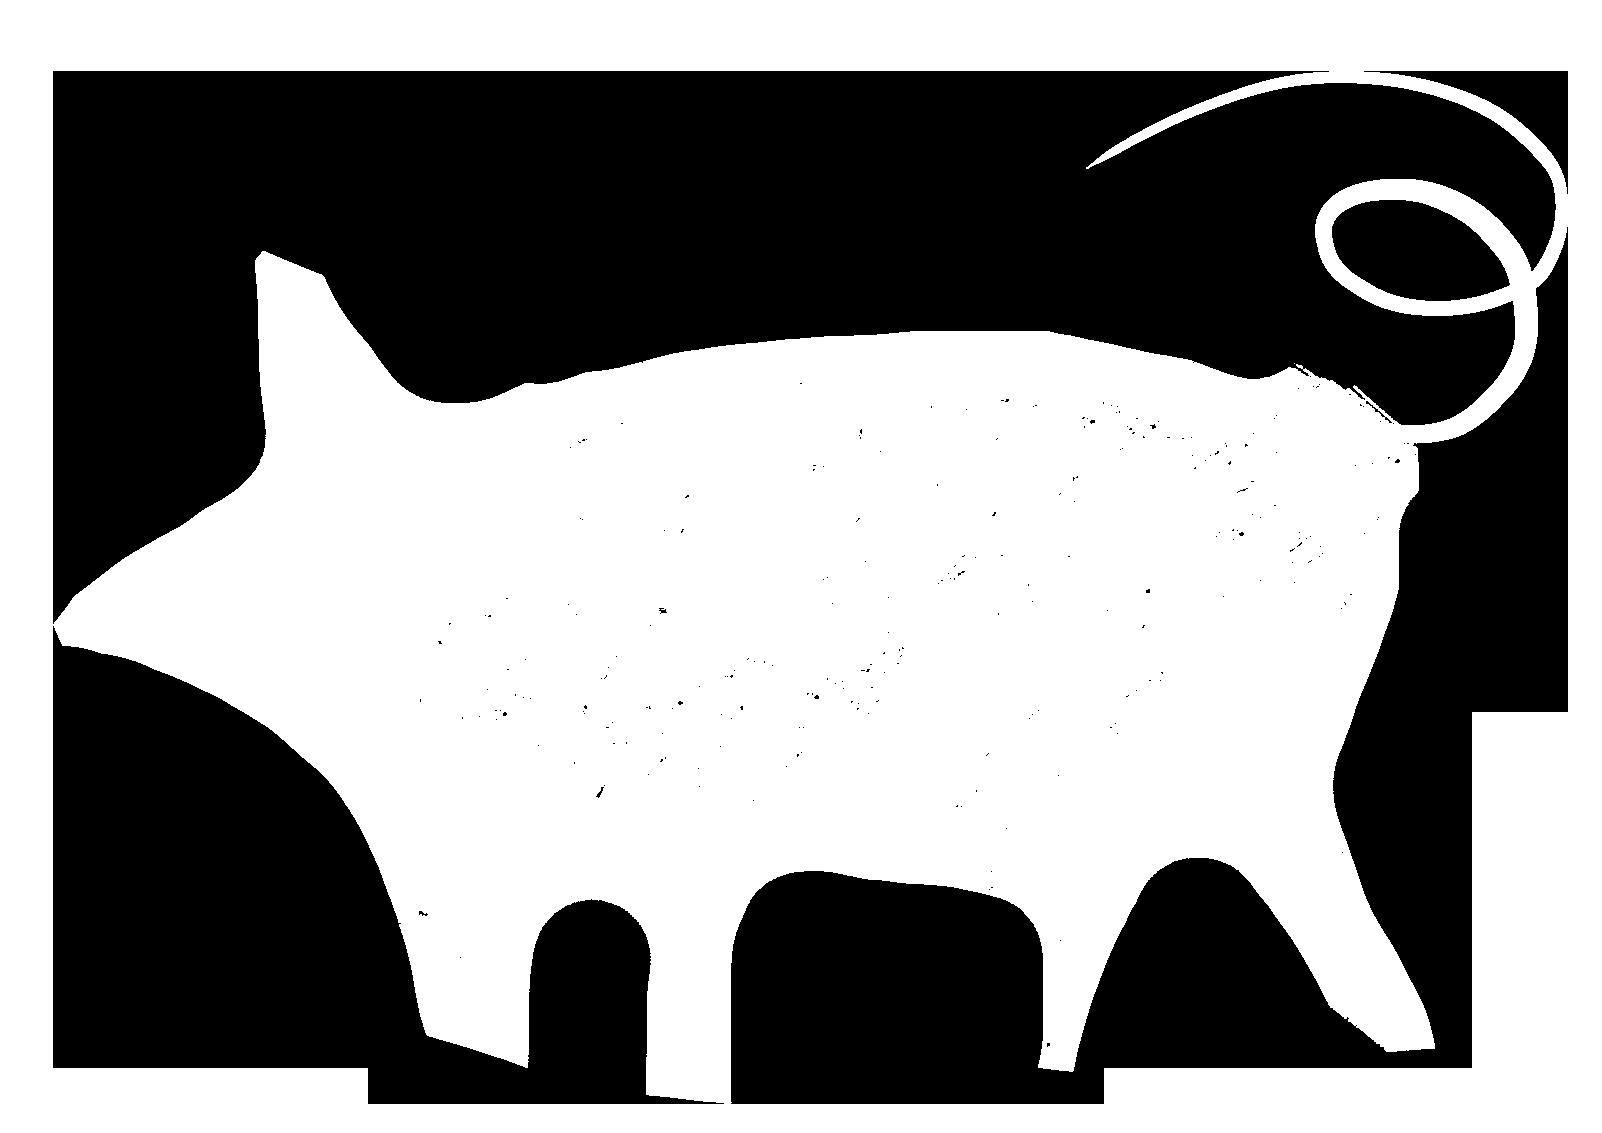 pork - 豬 肉 類